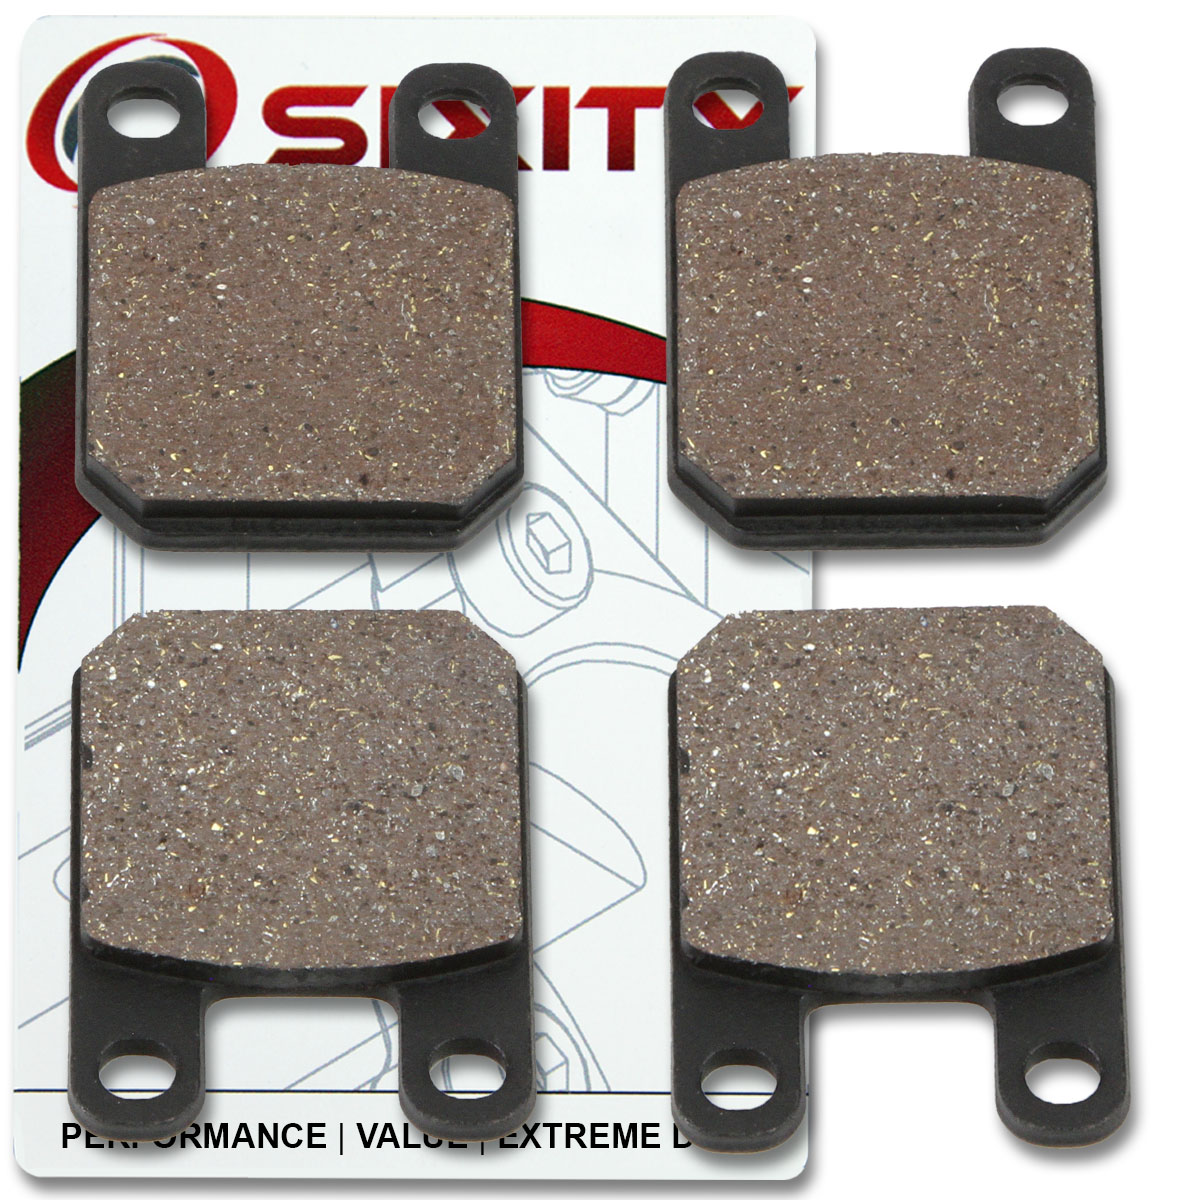 Front Rear Organic Brake Pads 2011 Kawasaki EX650 Ninja 650R Set Full Kit sx